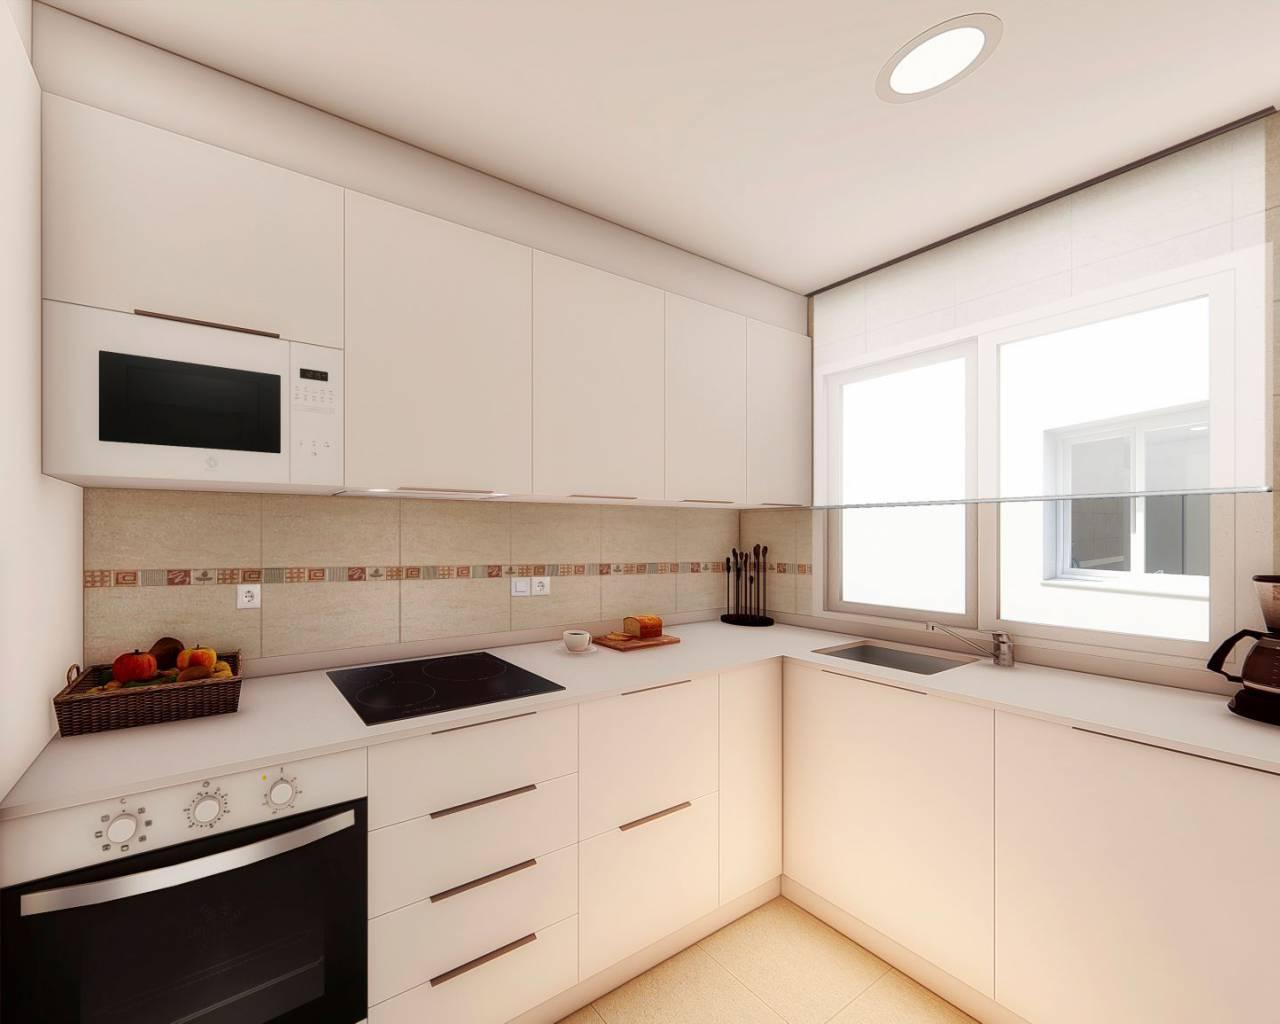 nieuwbouw-geschakelde-woning-duplex-torre-pacheco-santa-rosalia_4597_xl